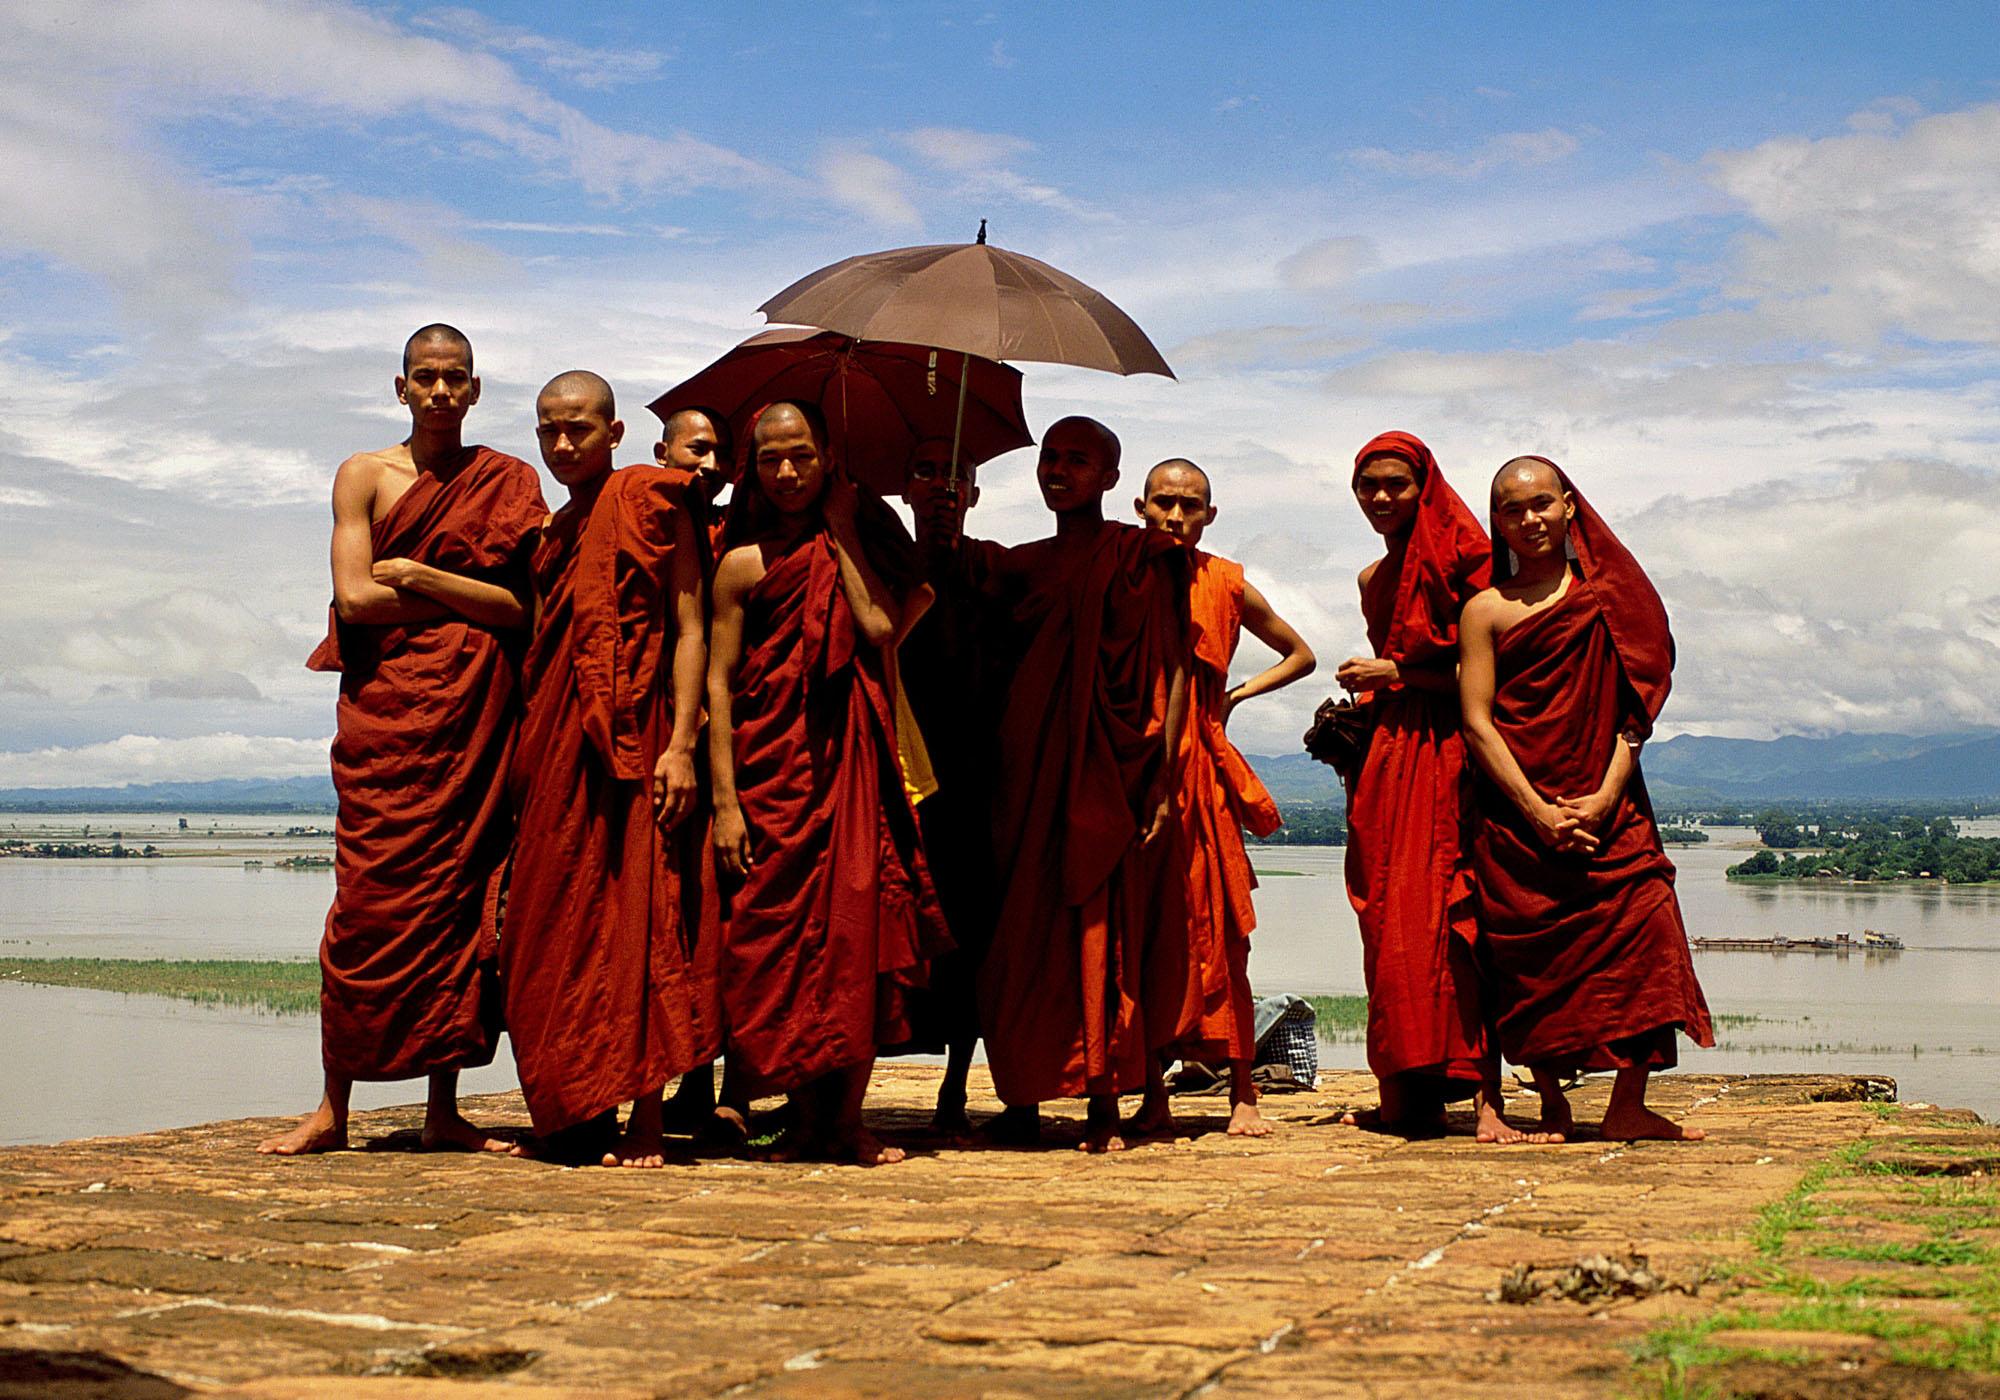 Monjes. Mandalay, Myanmar.